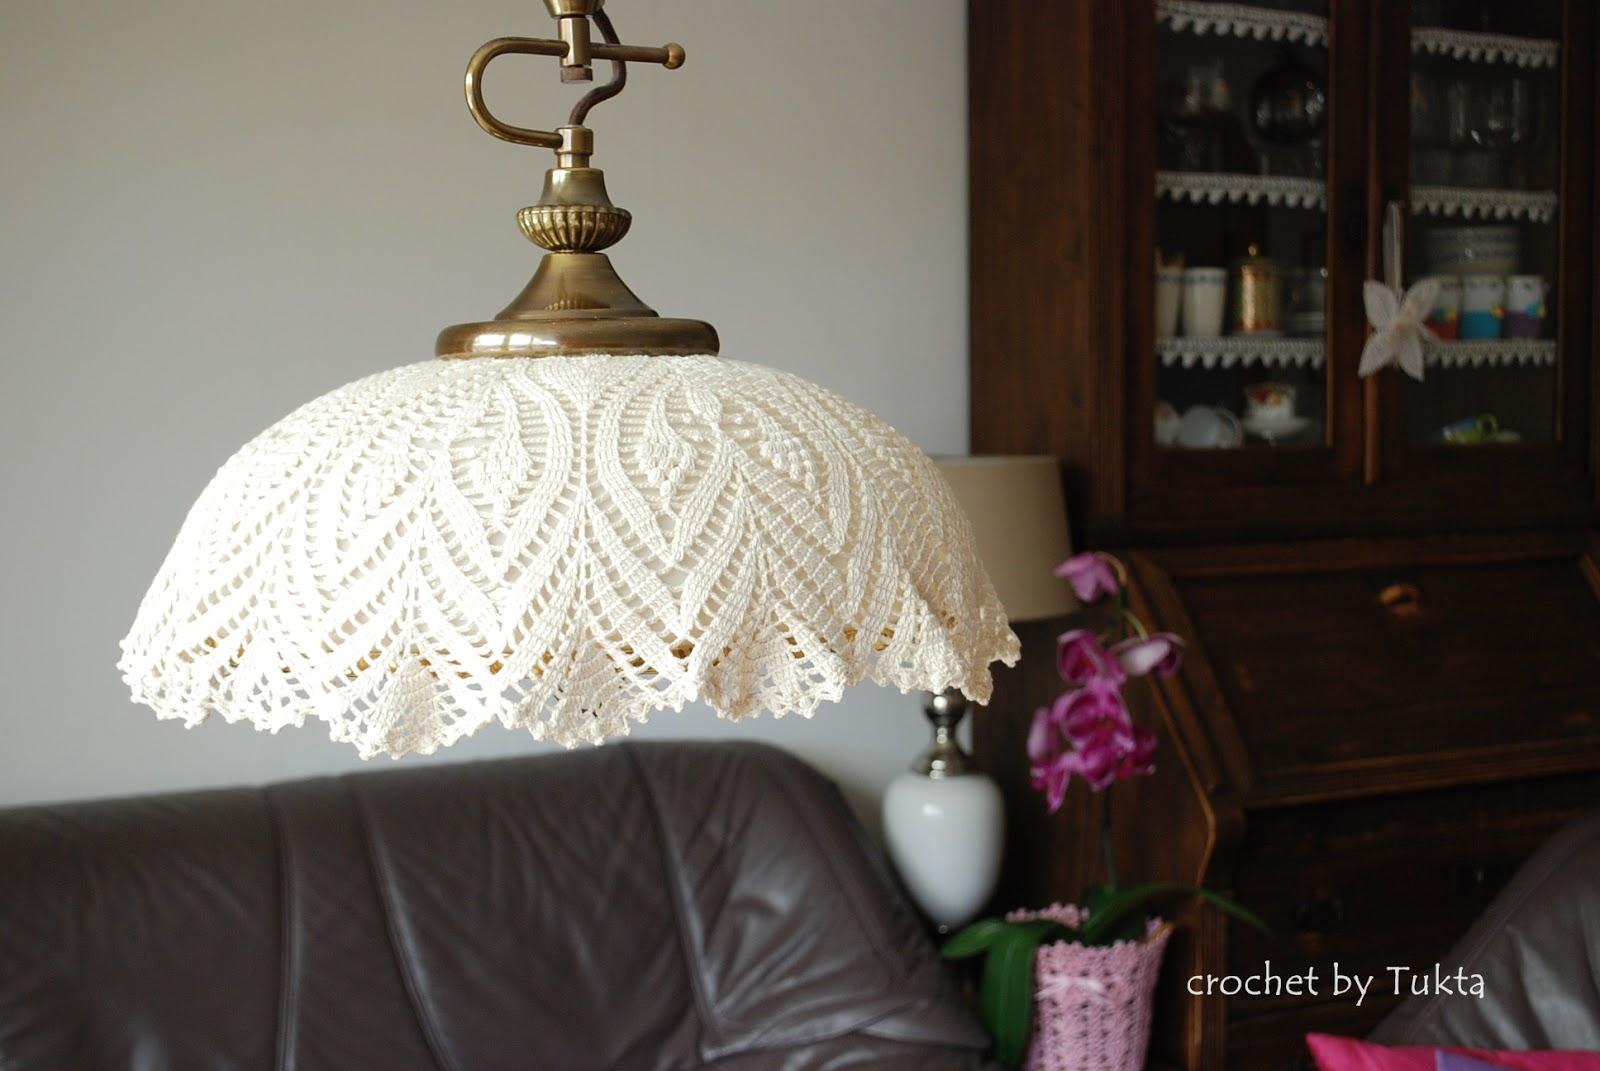 Crochet Pattern Lovely Lampshade : Crochet by Tukta: doily lampshade